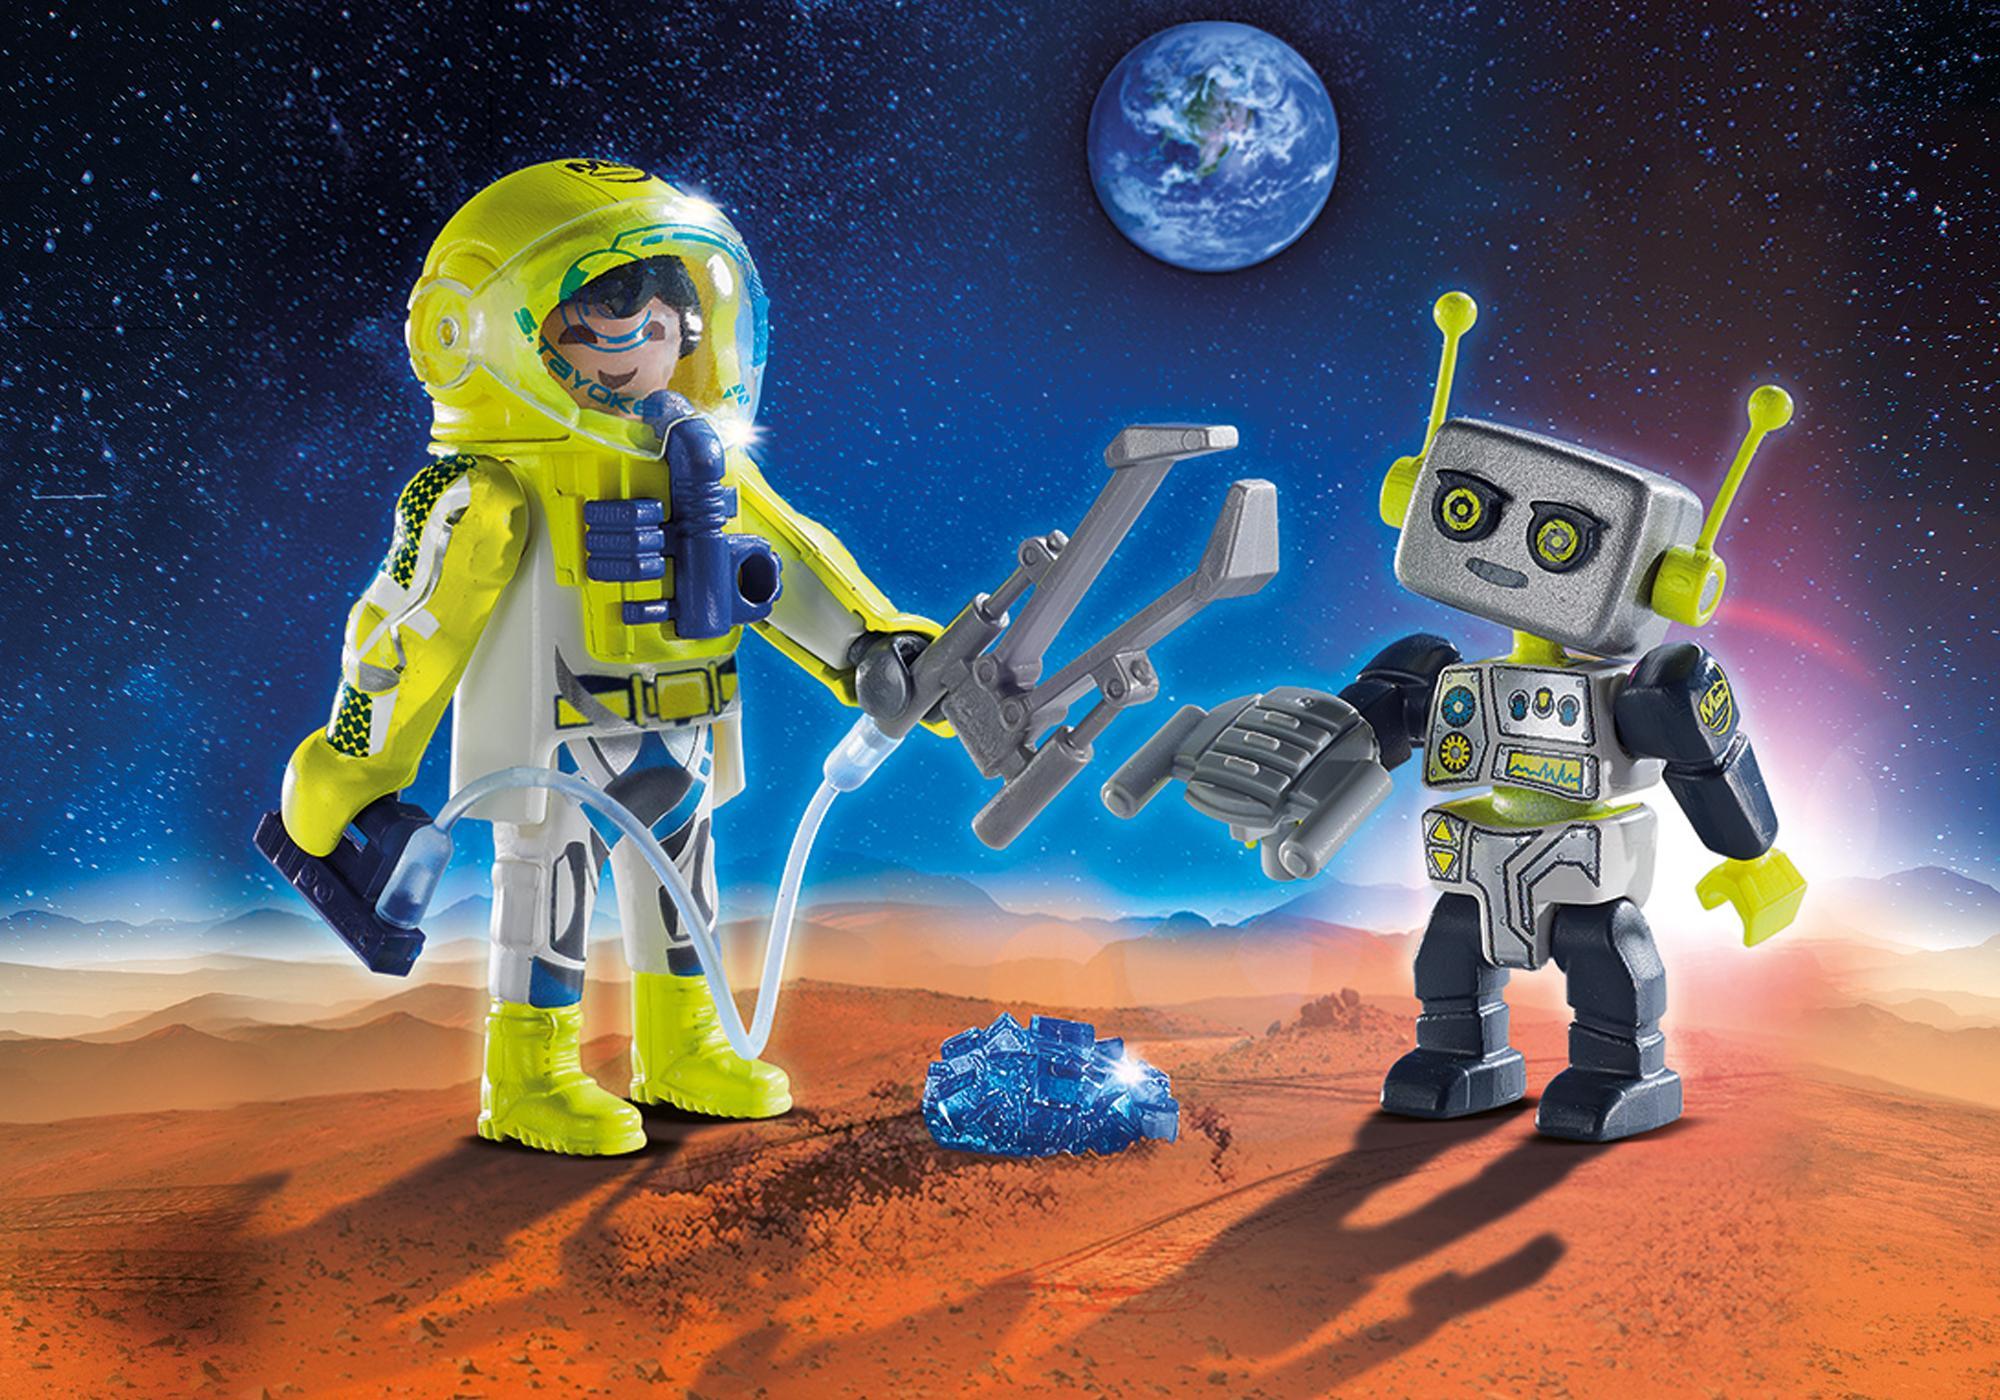 http://media.playmobil.com/i/playmobil/9492_product_detail/Duo Pack Astronauta e Robot